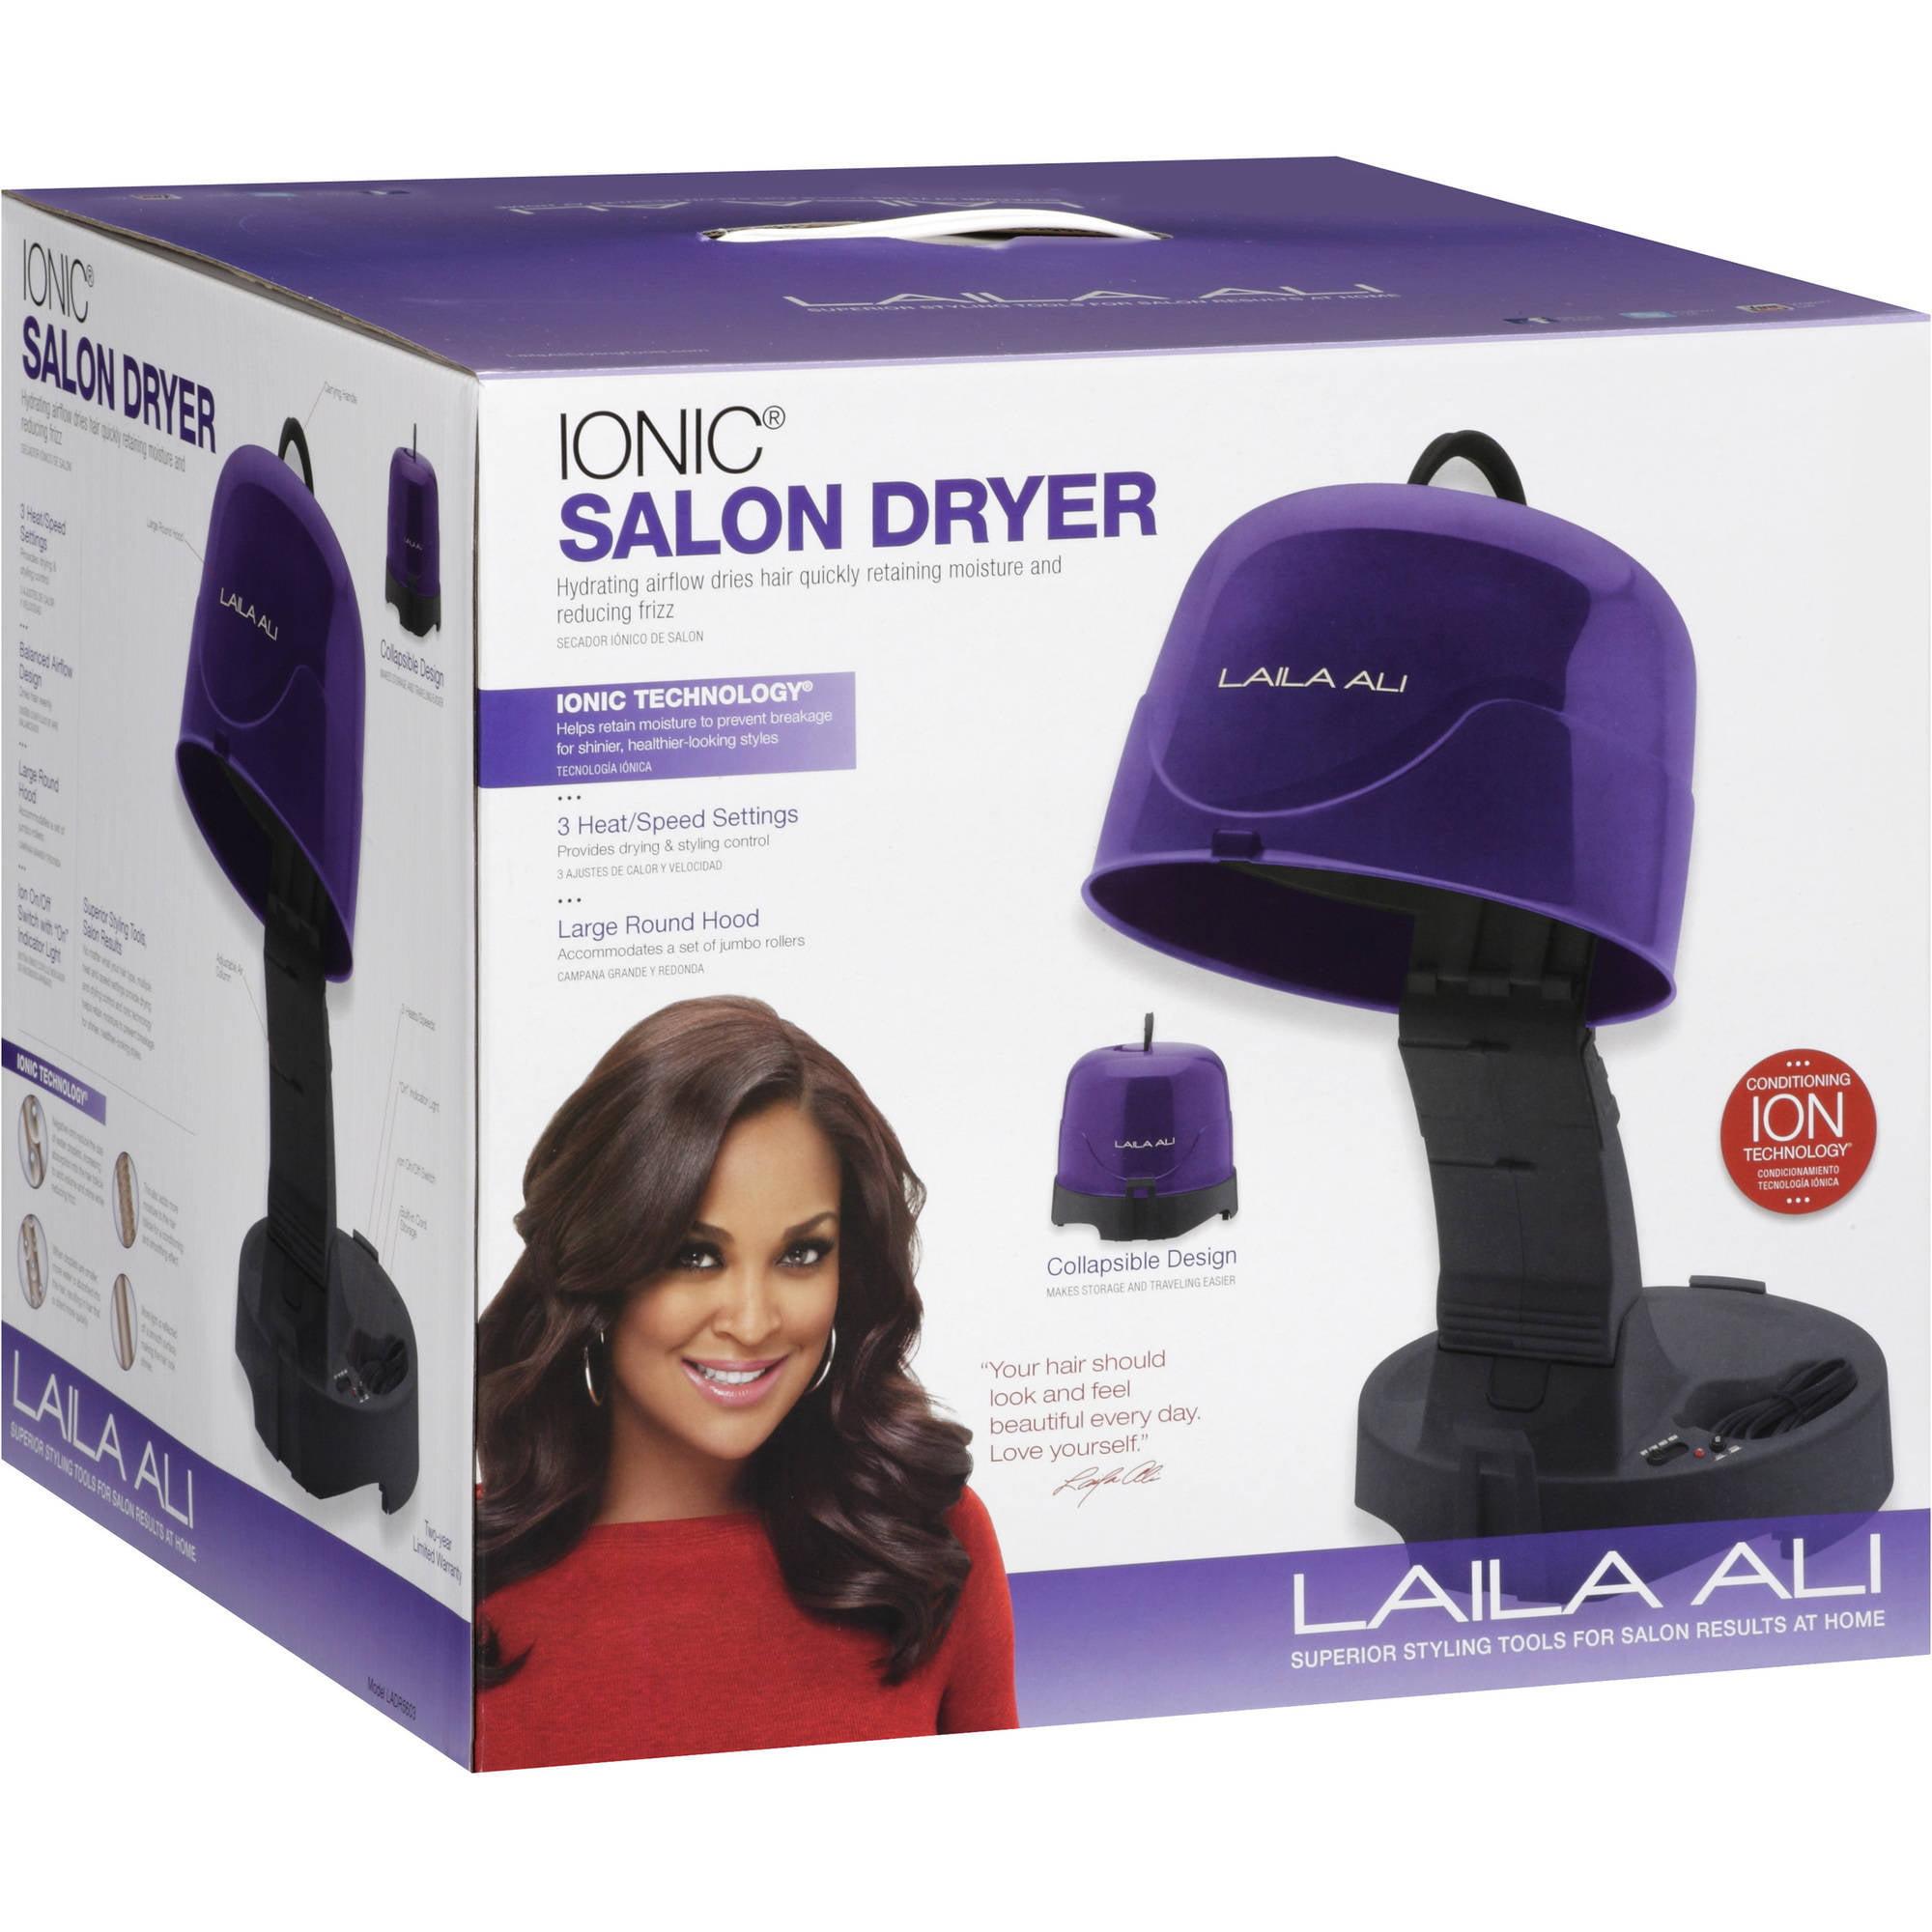 Cool Red By Kiss Salon 1875 Watt Hood Hair Dryer Walmart Com Short Hairstyles For Black Women Fulllsitofus